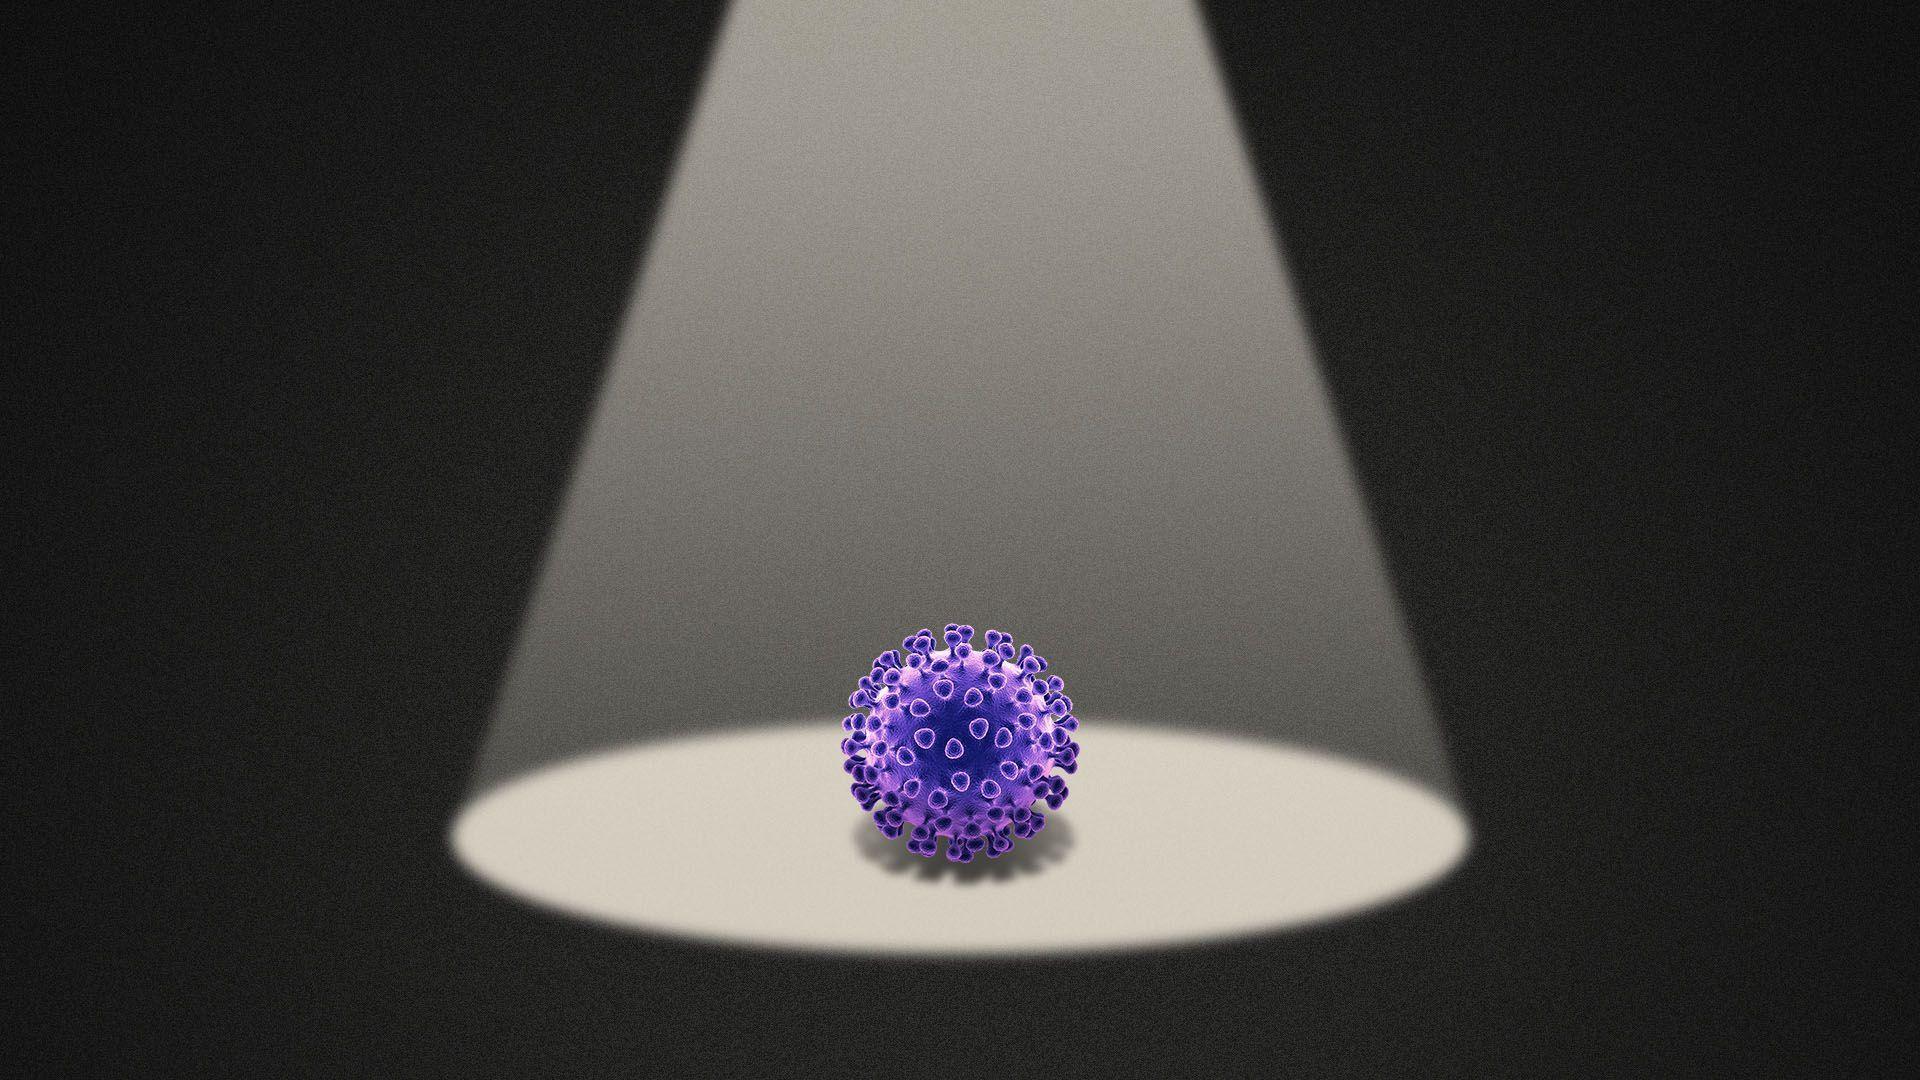 Illustration of a purple coronavirus under a spotlight in the dark